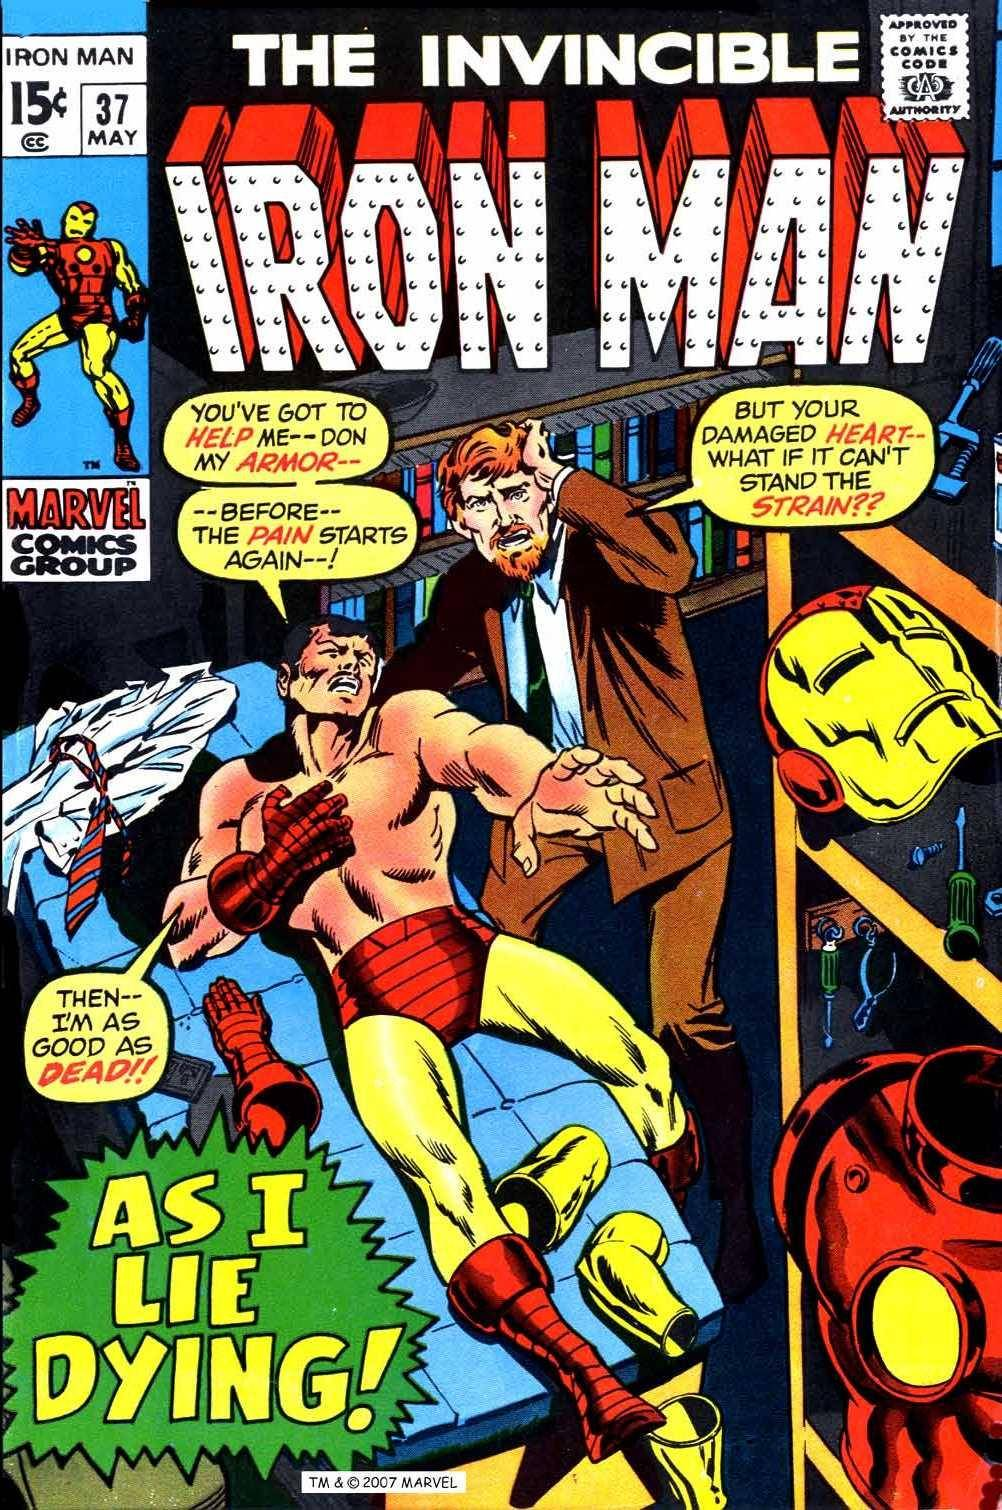 For PostalPops - Iron Man v1 037 Complete Marvel Collection cbz